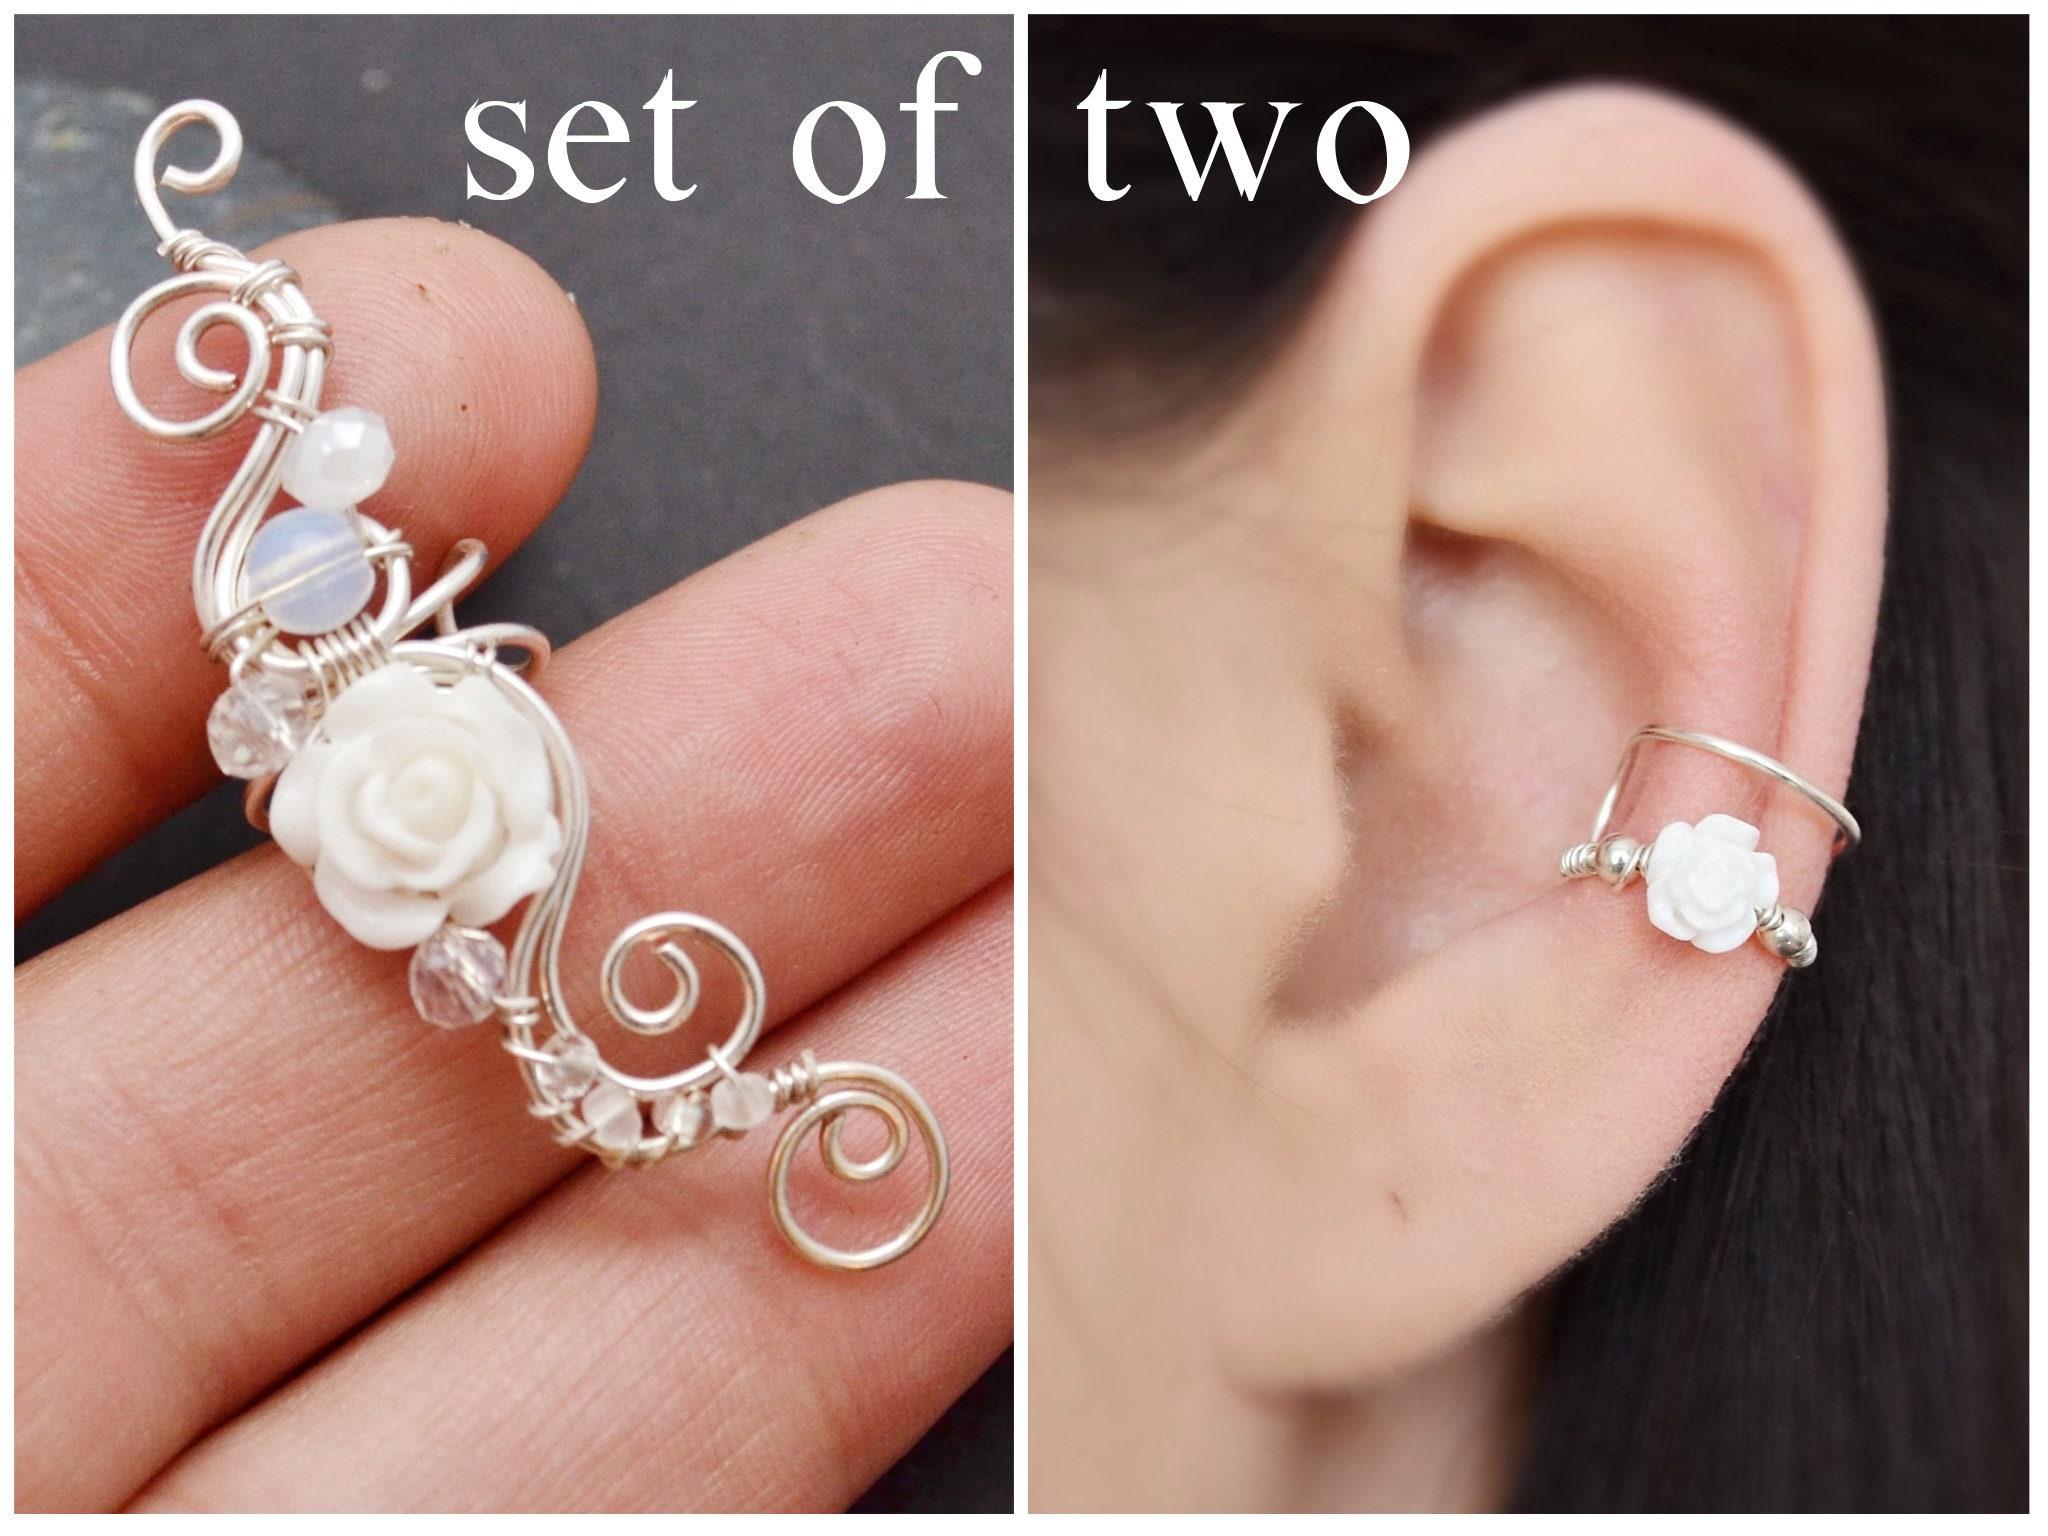 Wedding Ear Cuffs no Piercing Ear crawler earrings White Rose Fake Earrings Bridal Moonstone Earrings